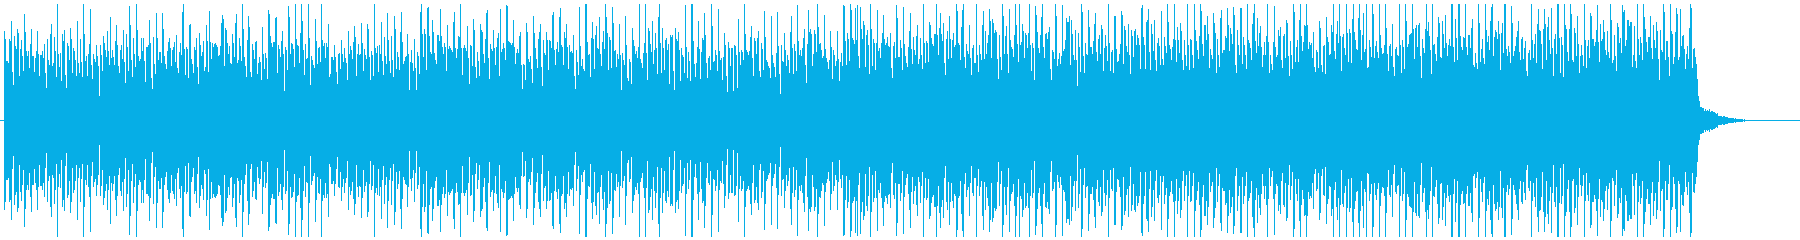 EDM風のクールなゲームミュージックの再生済みの波形